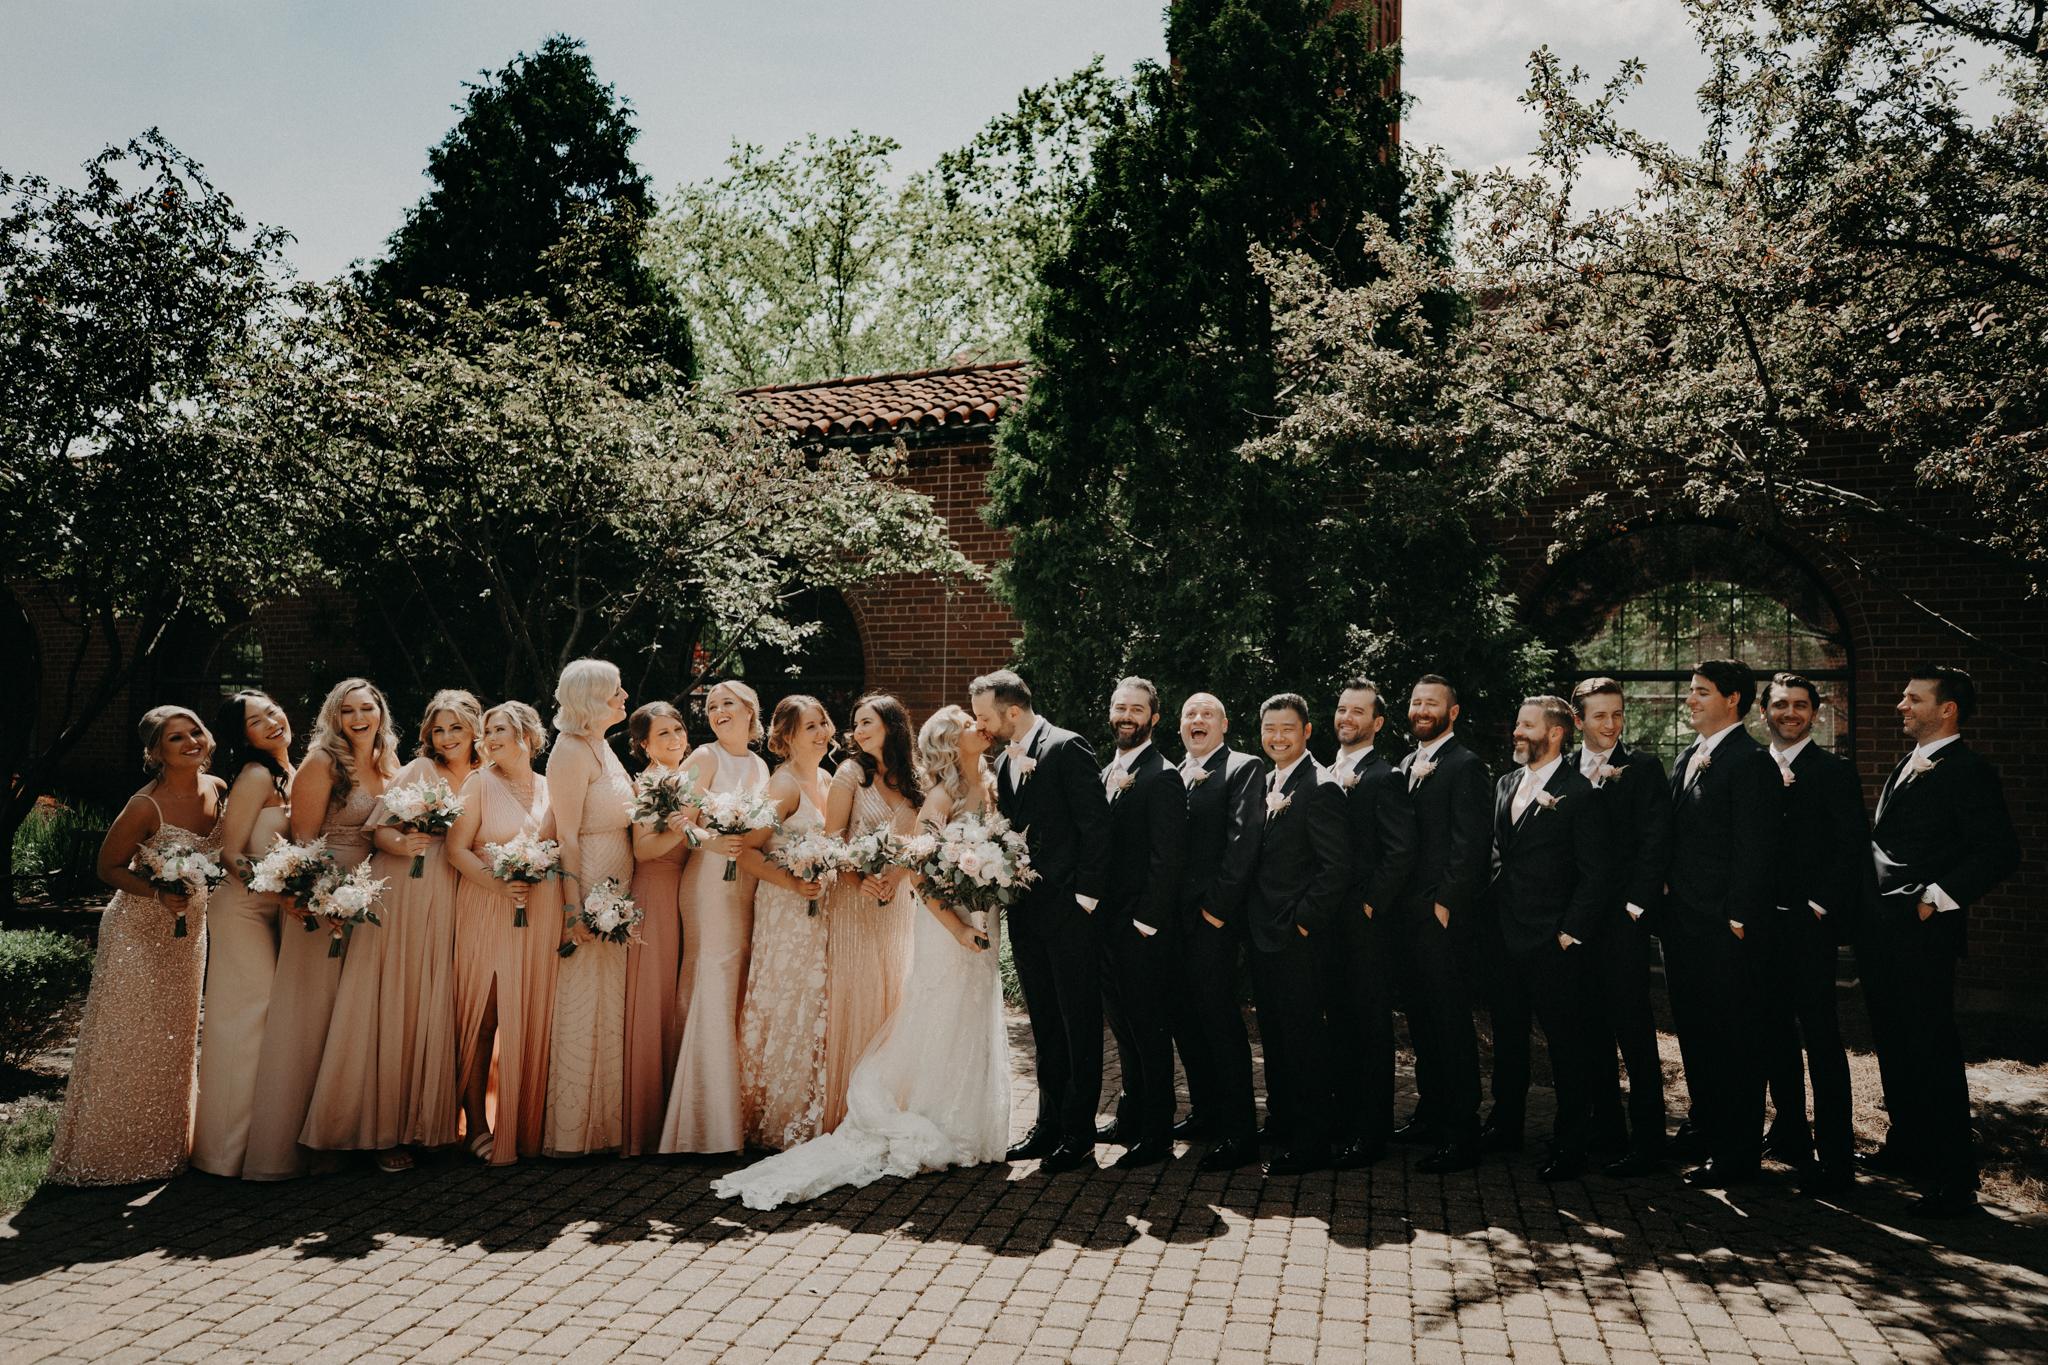 The-Inn-At-St-Johns-Wedding-19.jpg